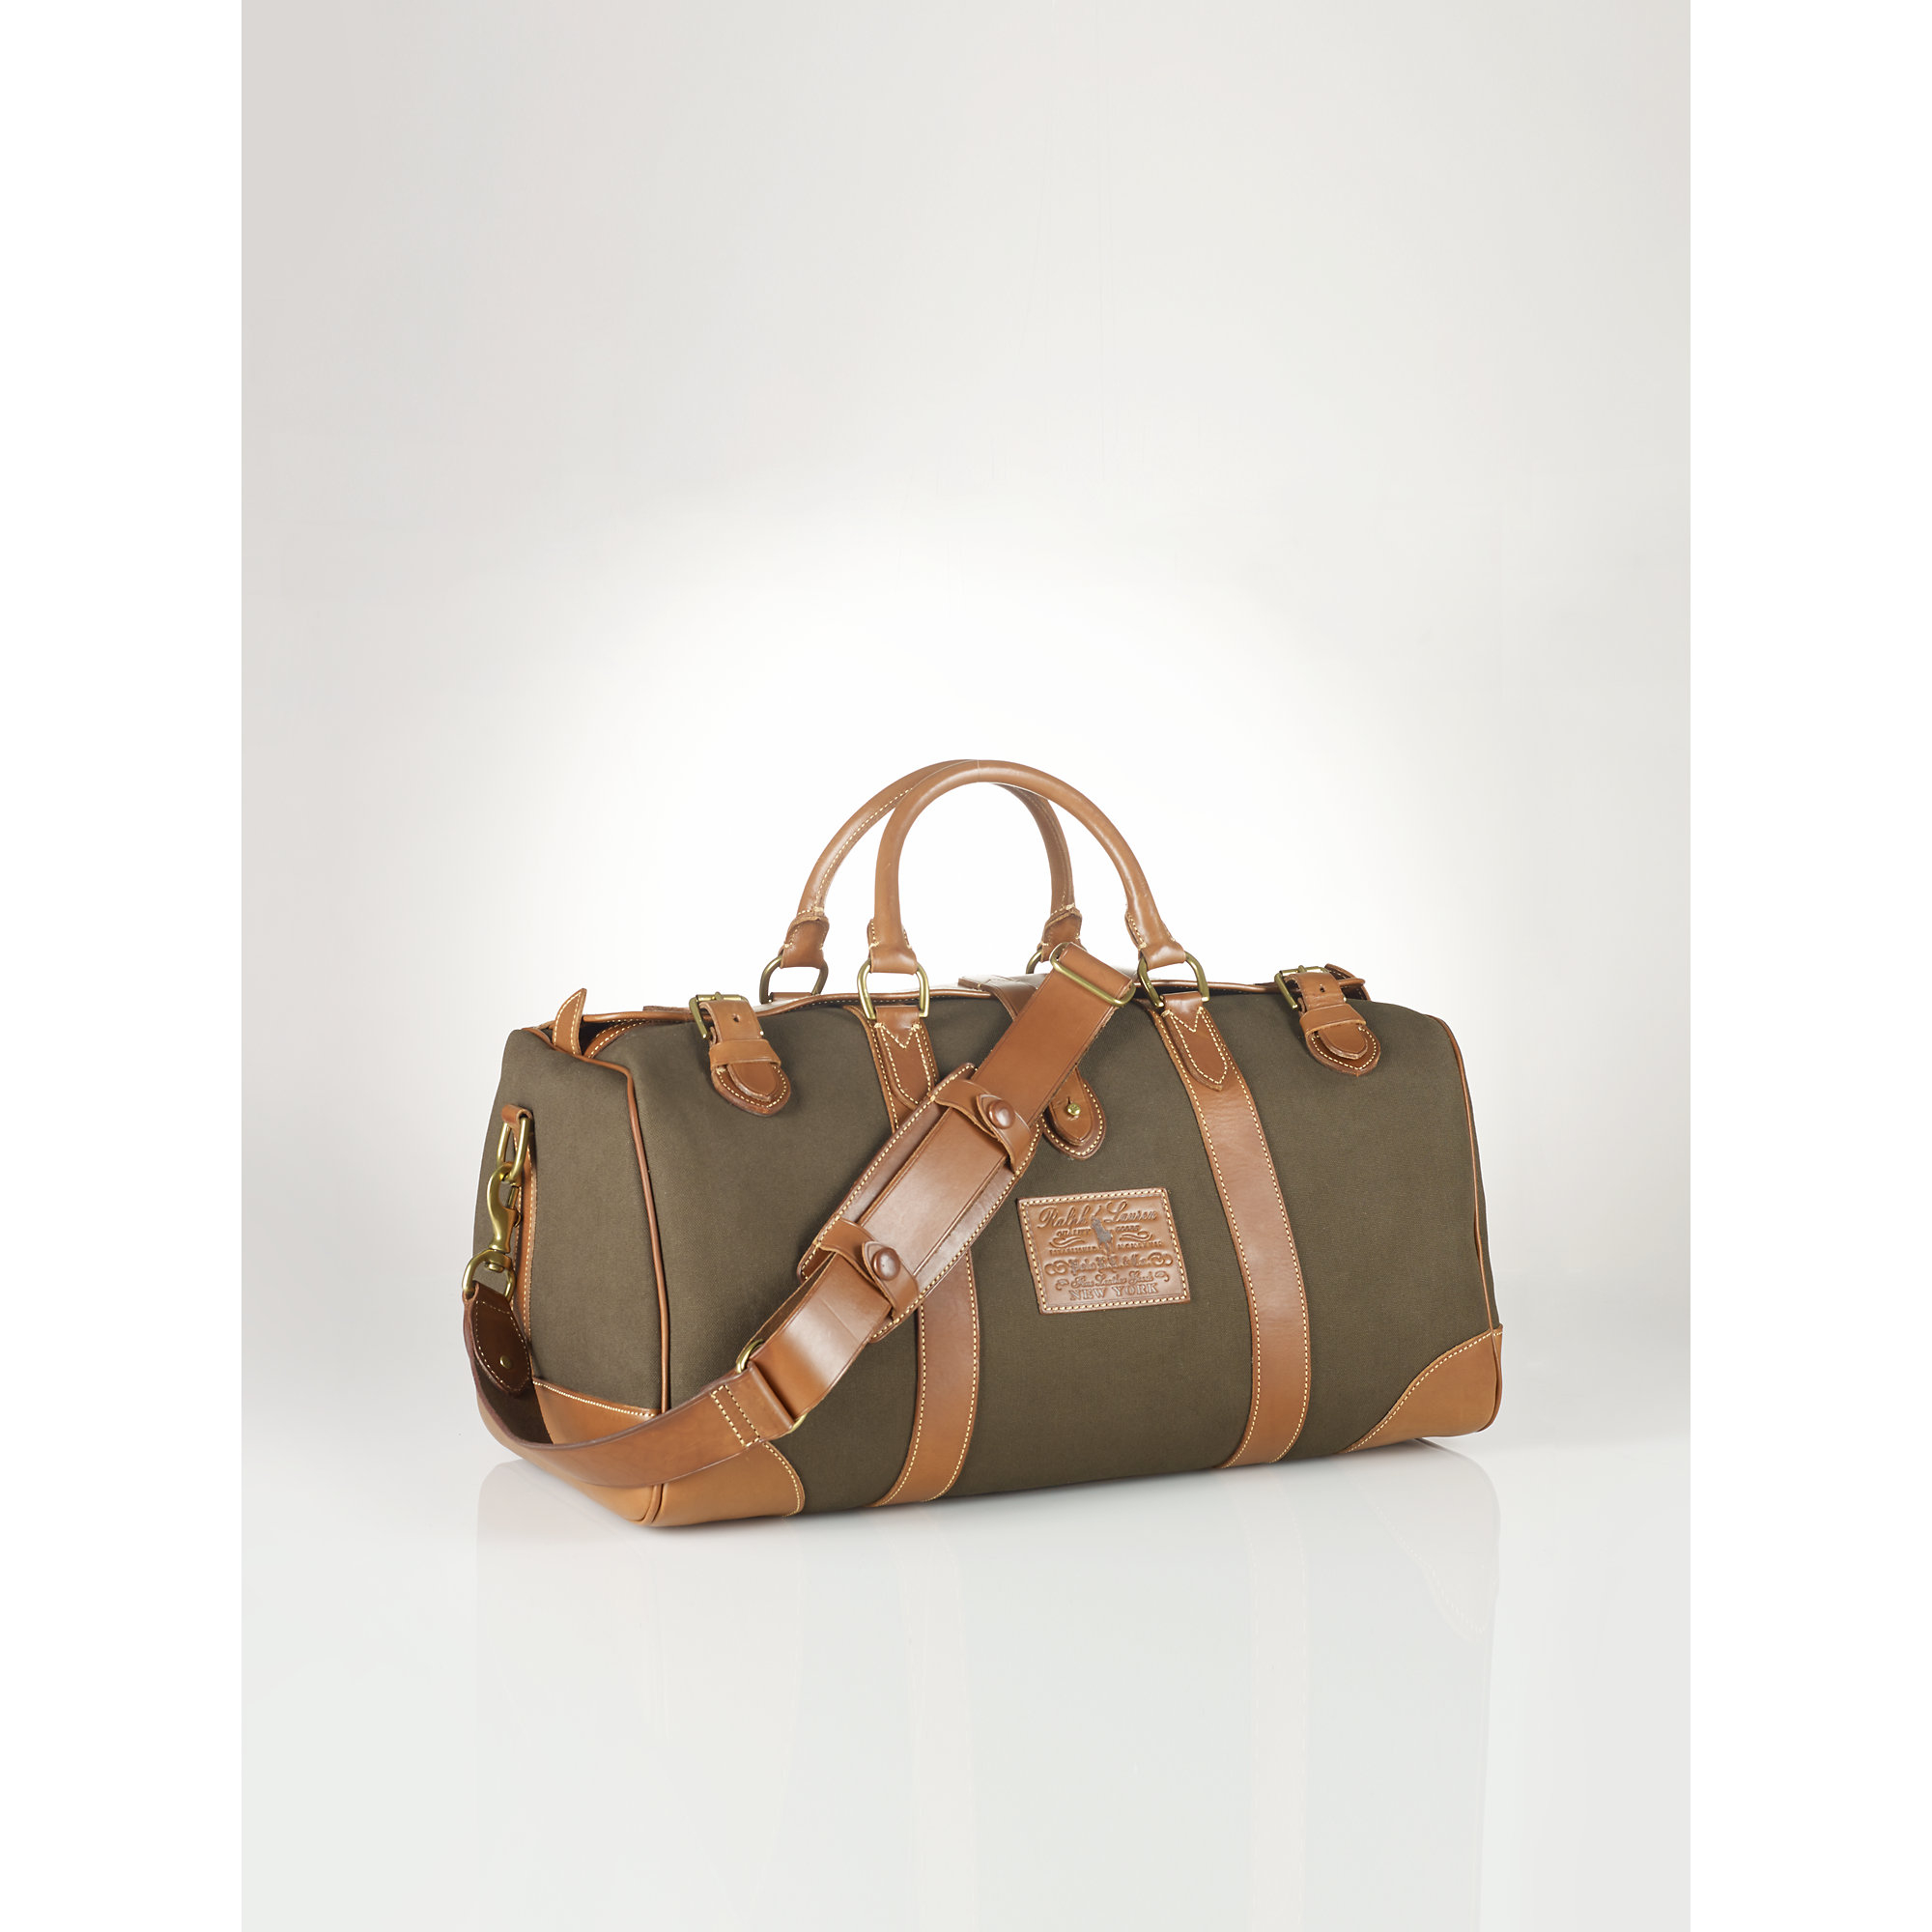 2f0fad11fc68 Ralph Lauren Polo Gym Bag